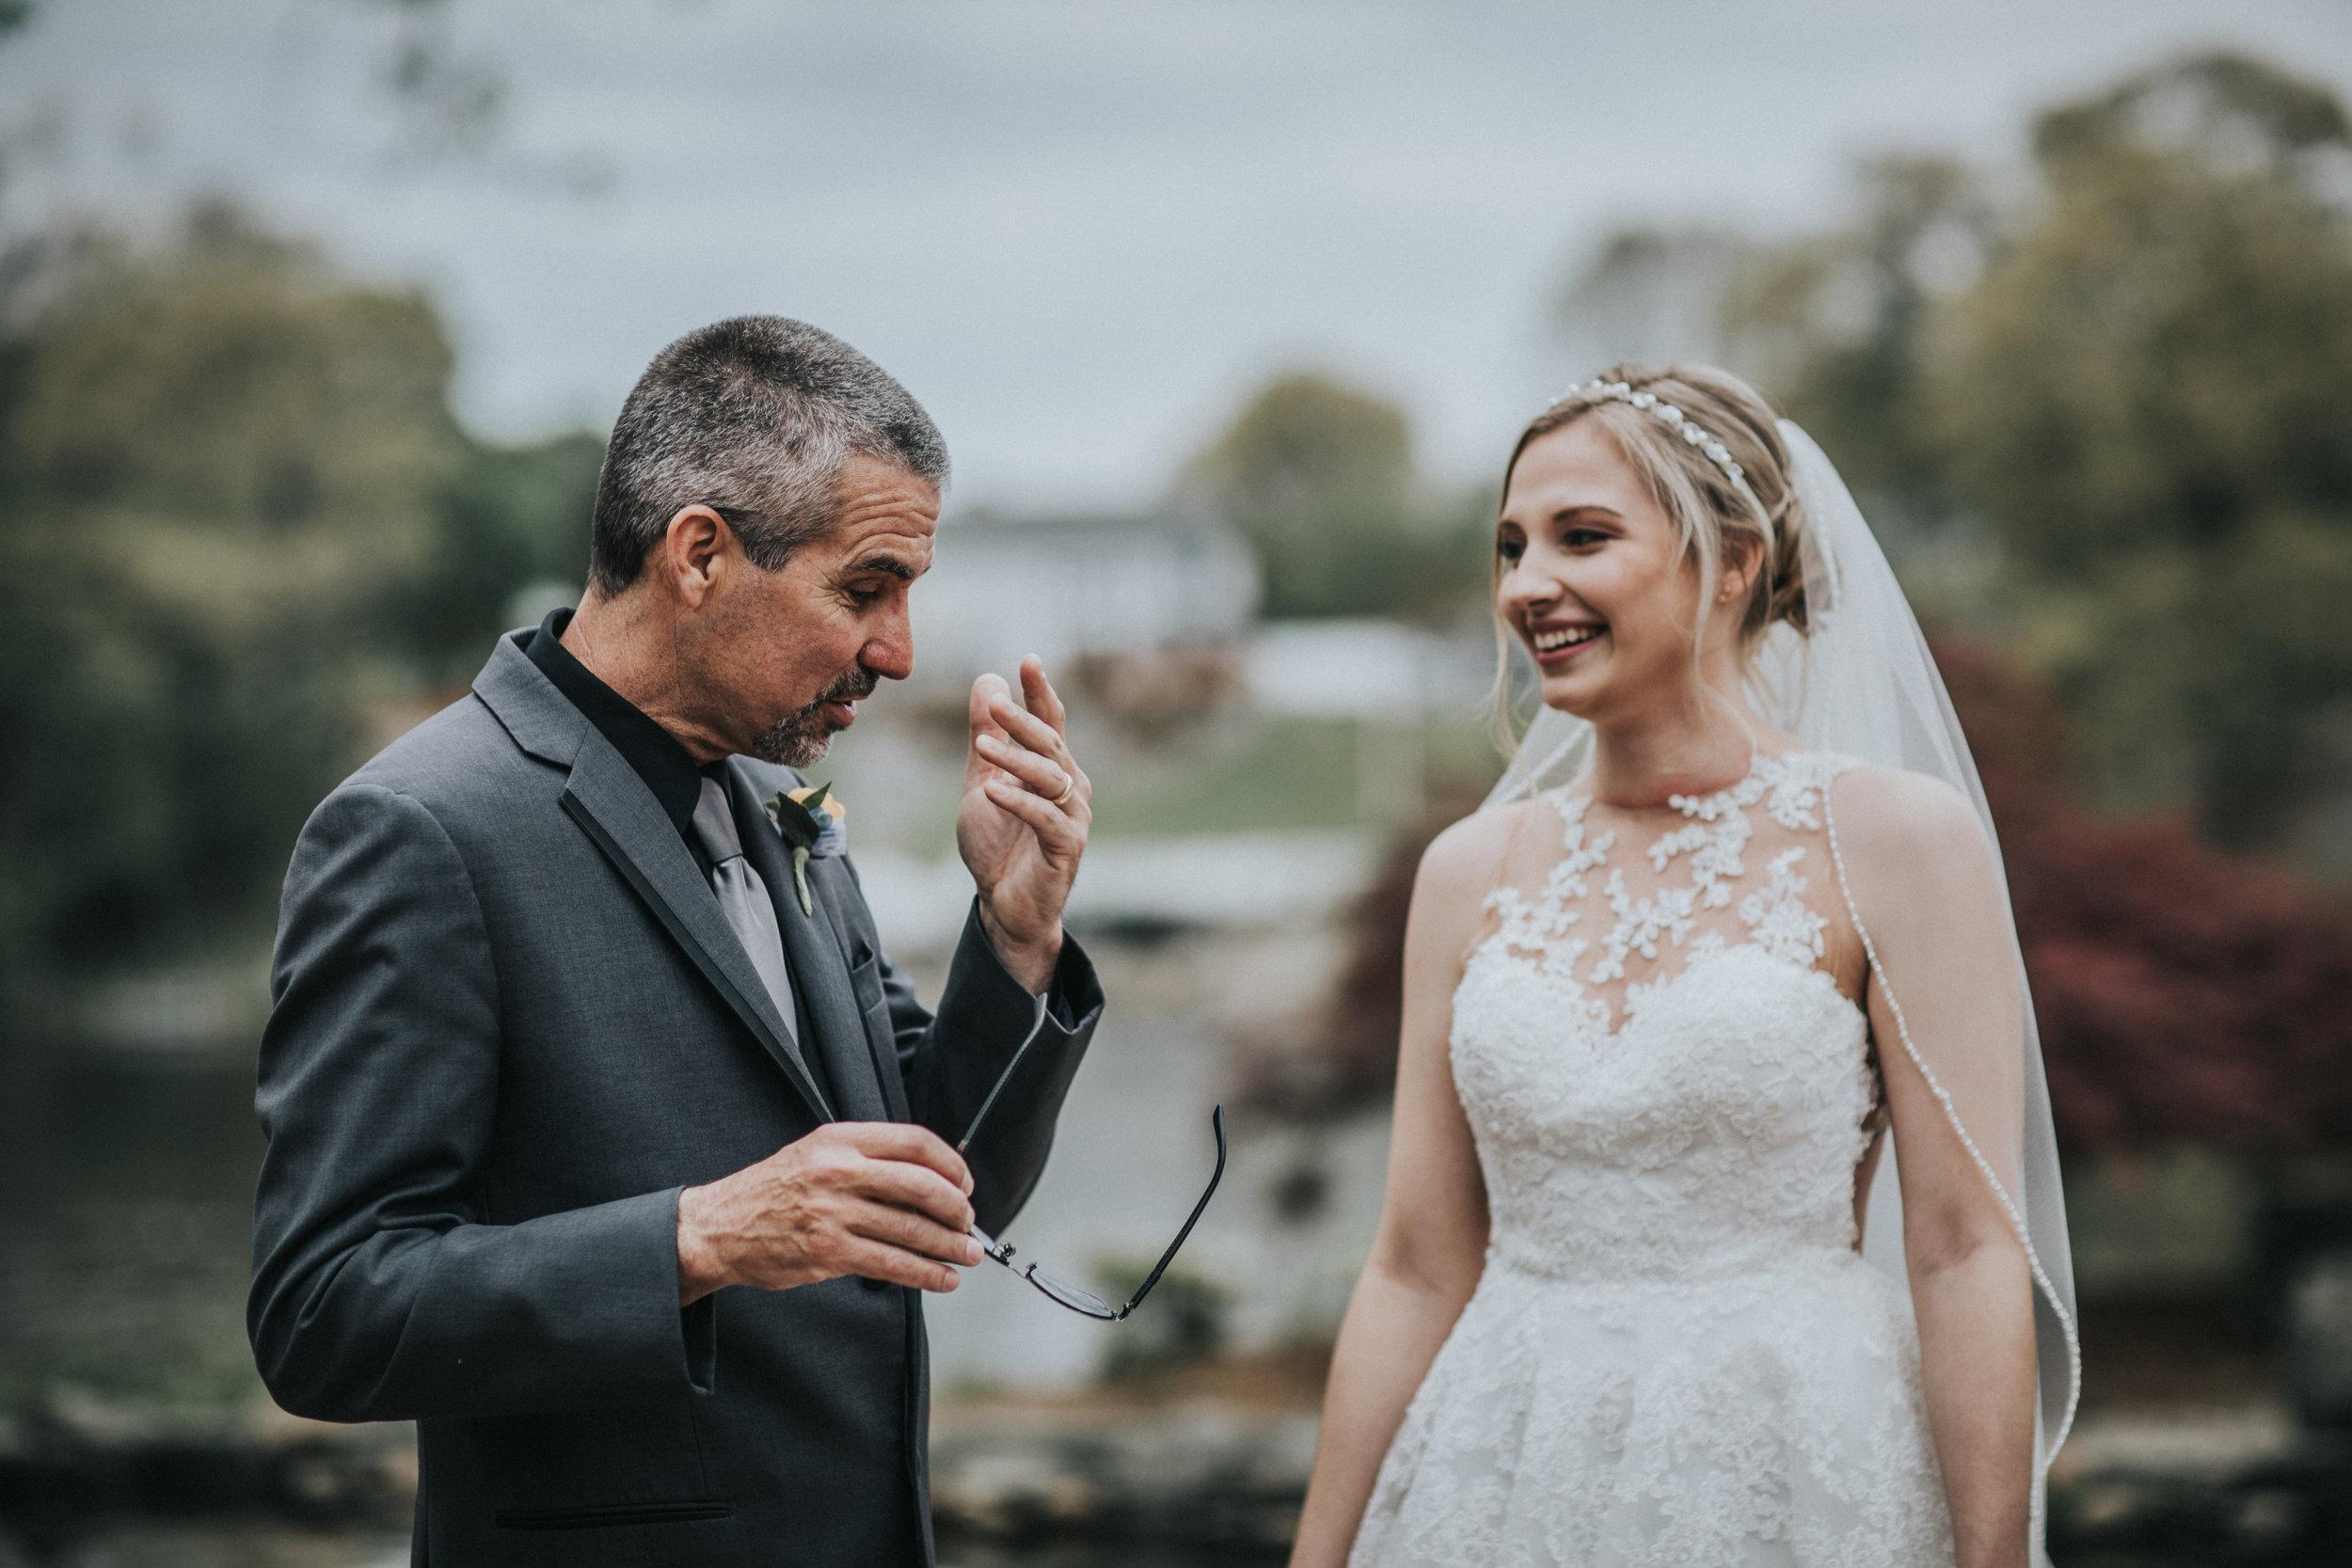 New-Jersey-Wedding-Photographer-Megan&Nick-FirstLooks-32.jpg